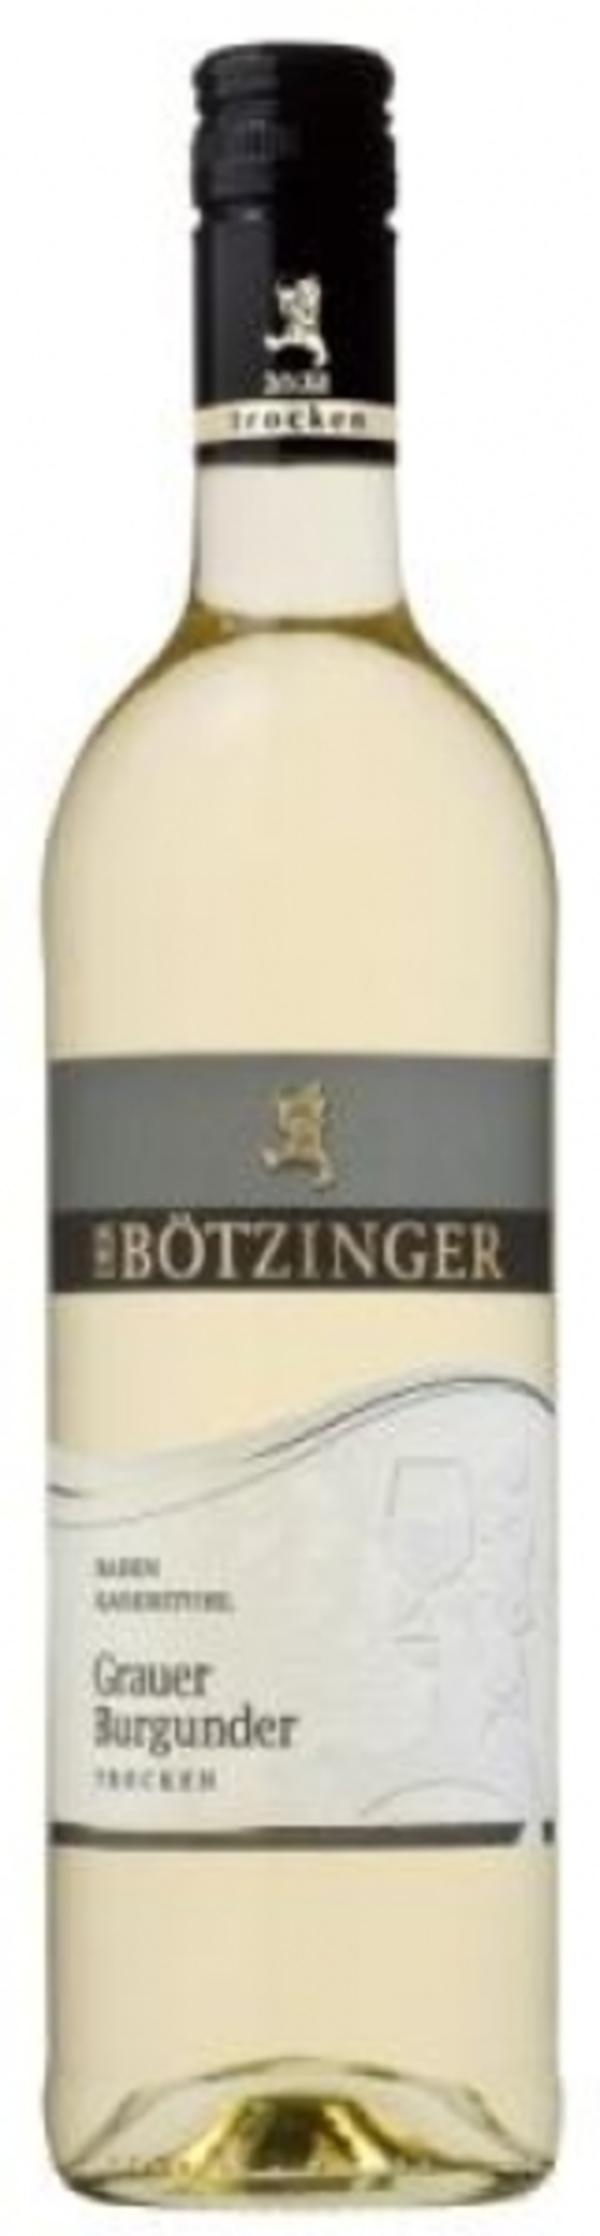 WG Bötzingen Grauer Burgunder trocken 2018 0,75 ltr